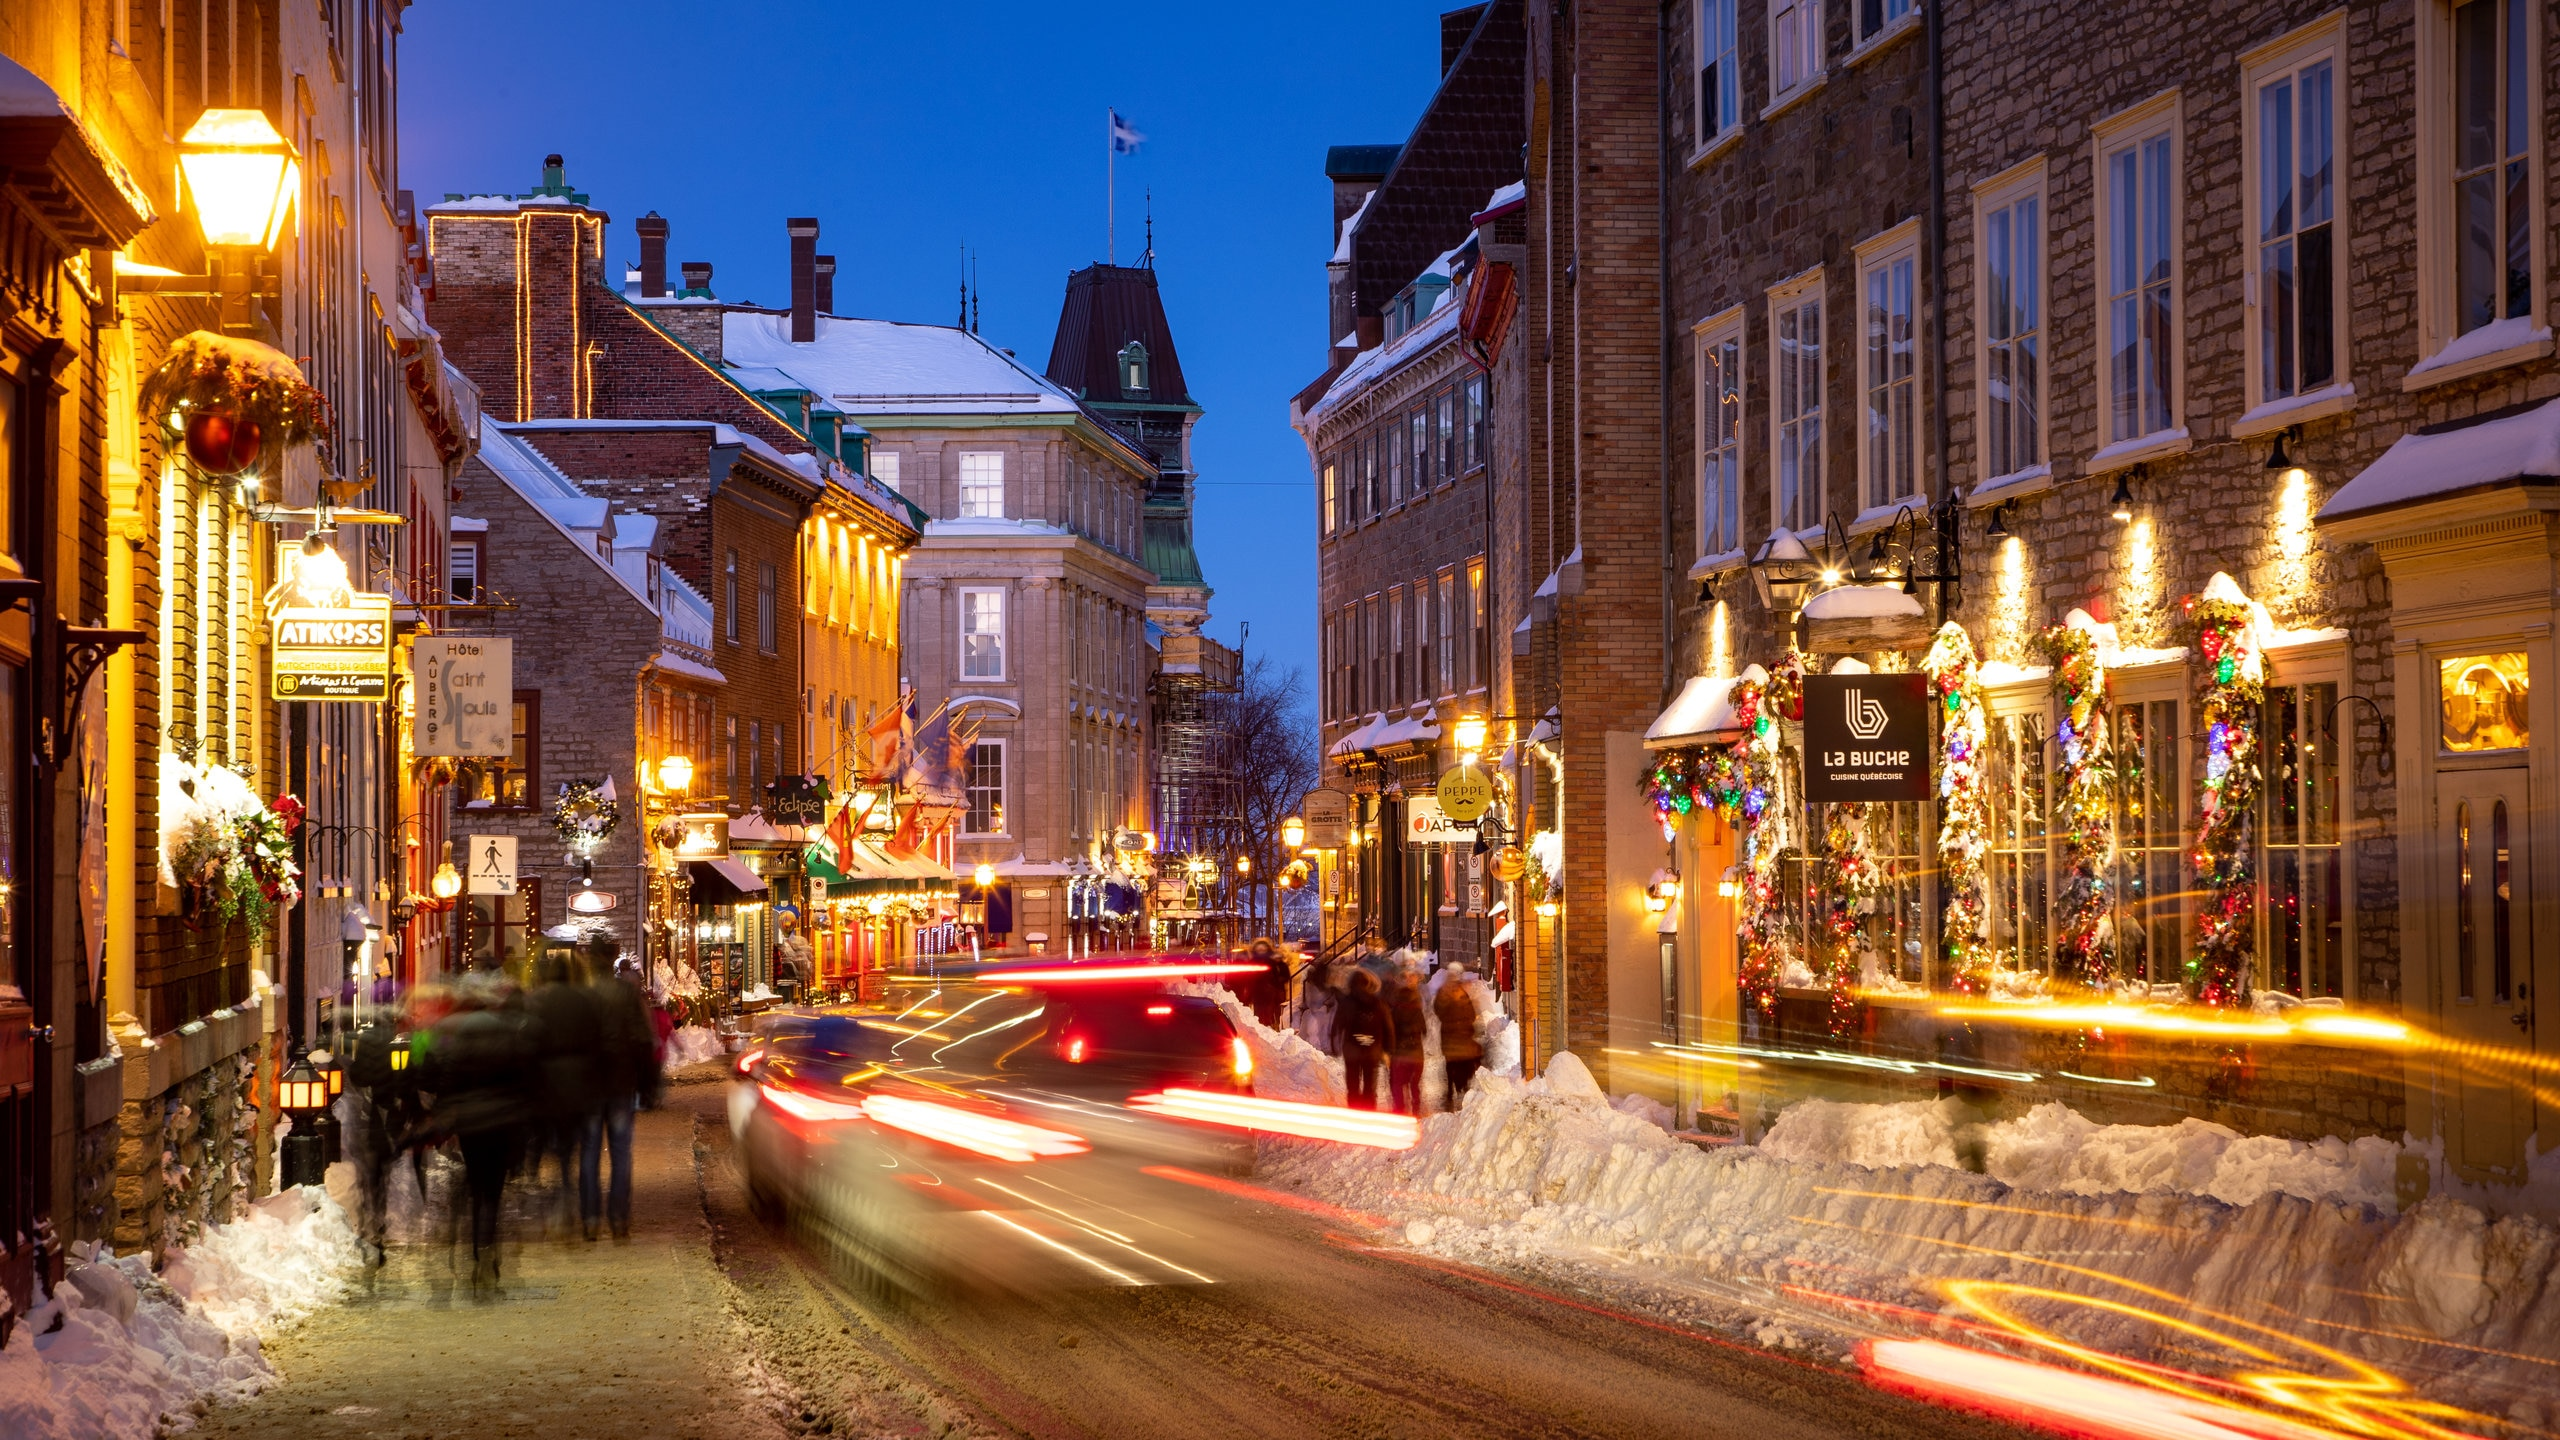 Old Quebec, Quebec, Quebec, Canada